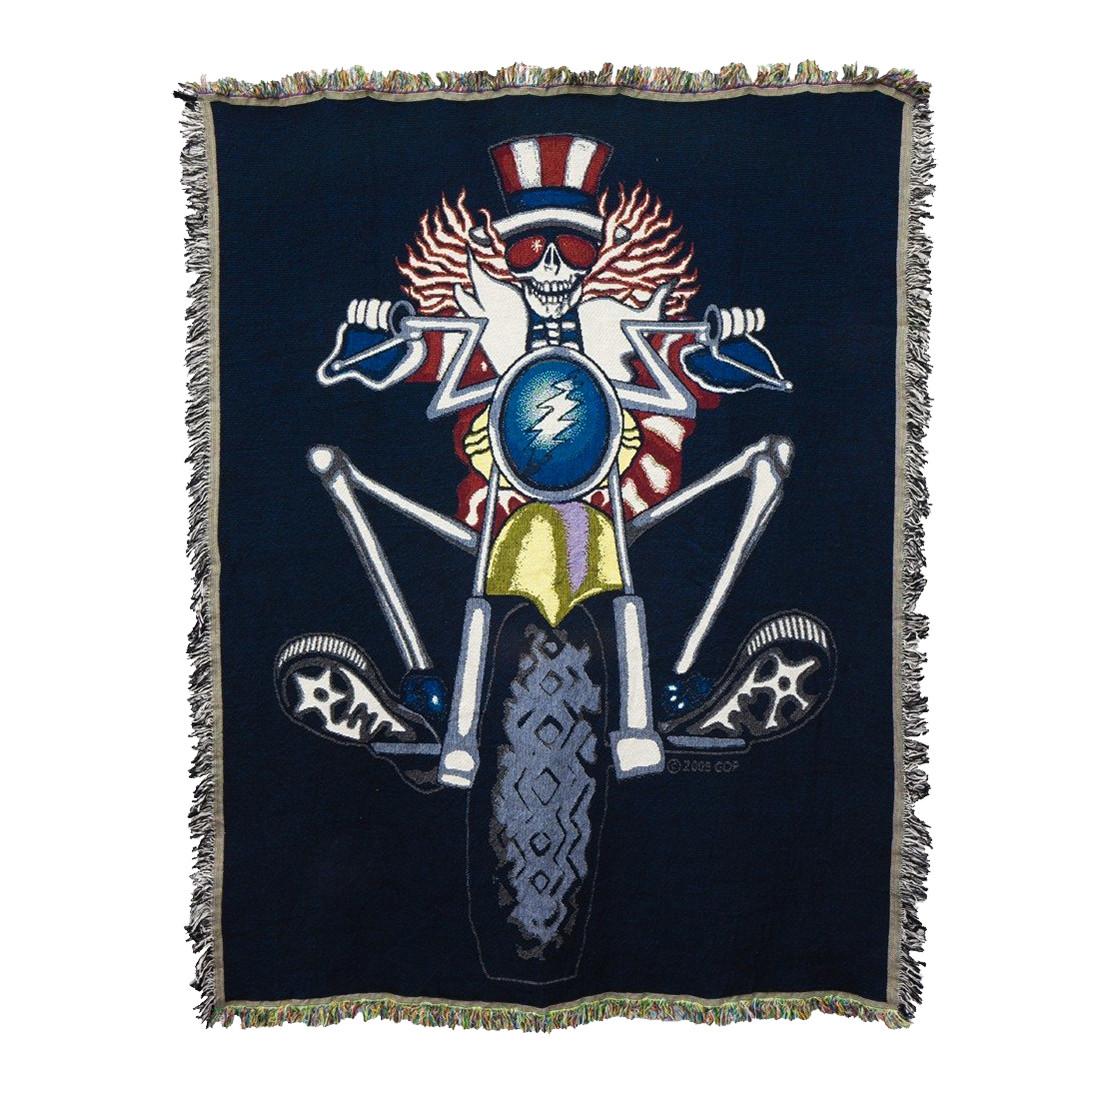 GD Pyscle Sam Woven Blanket